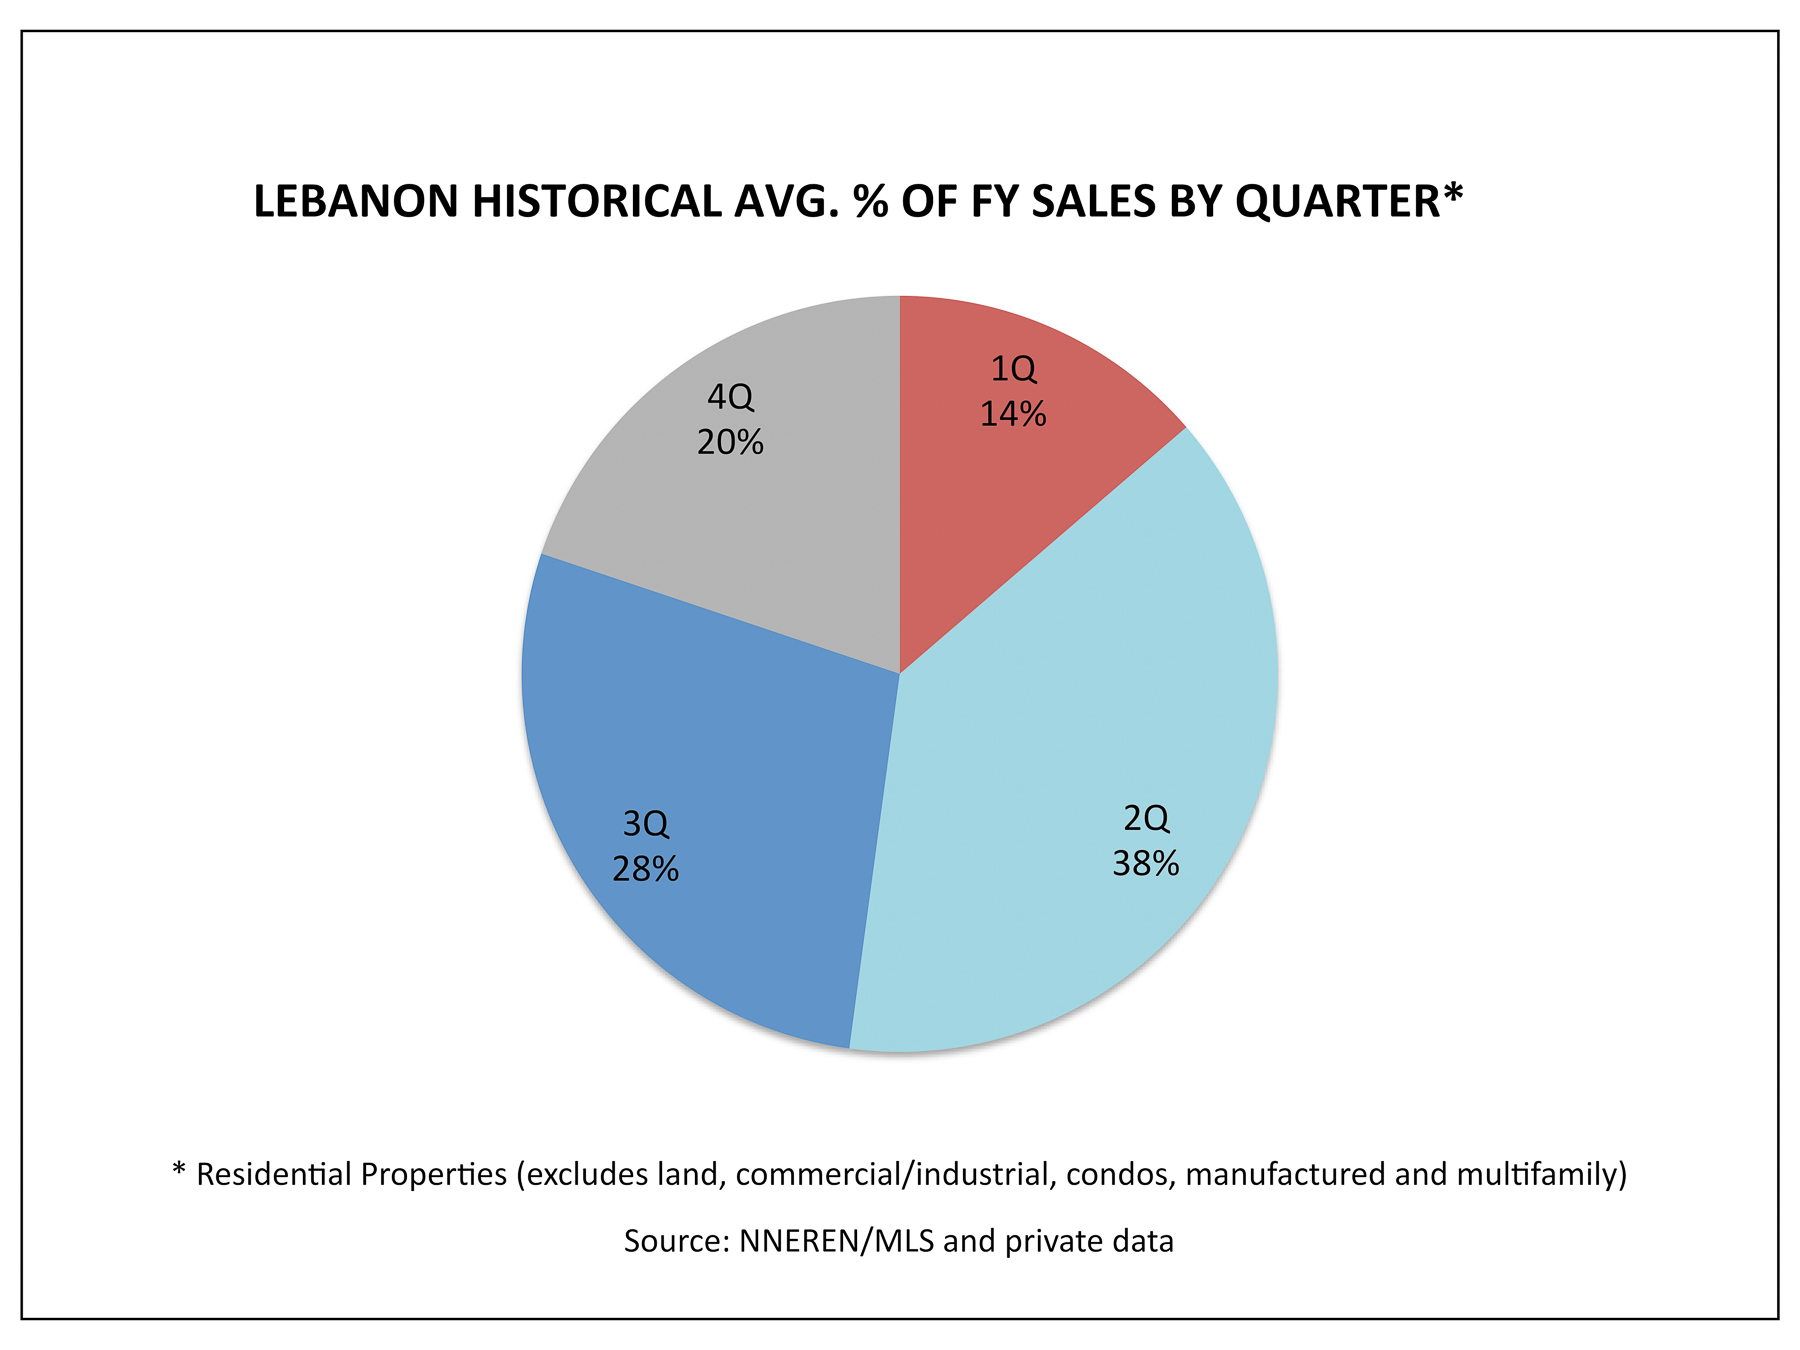 Lebanon NH Real Estate Market - 1Q Historical Avg % Homes Sold by Quarter